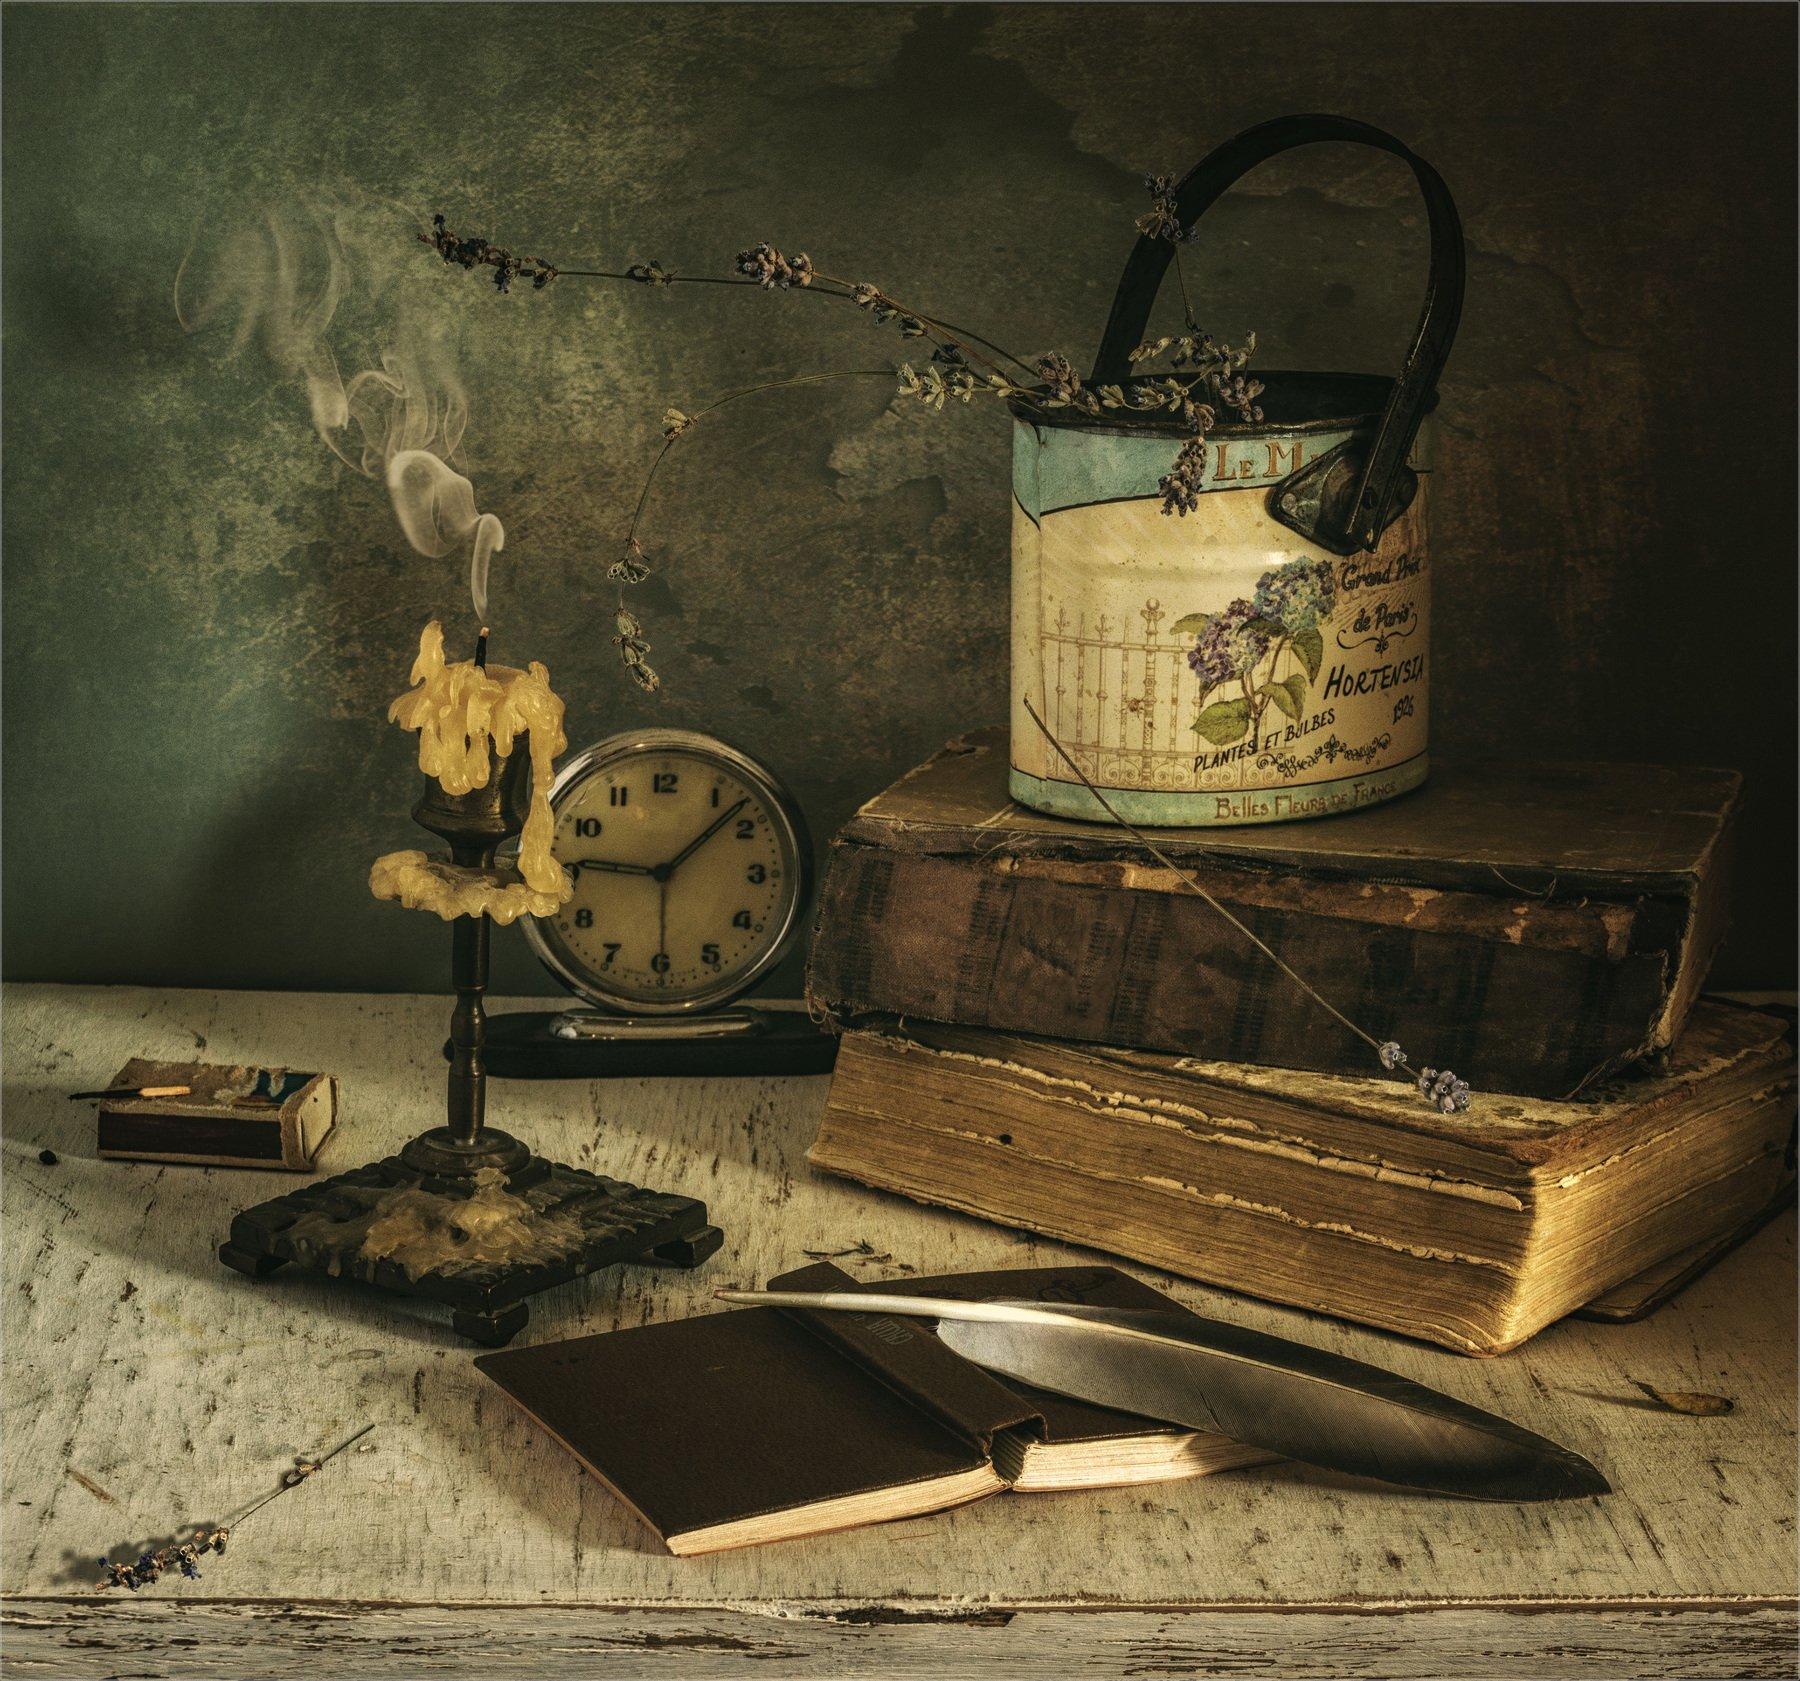 still life, натюрморт, винтаж, ретро, часы, книга, спички, табак, коробка, книги, свеча, подсвечник, дым, ведерко, перо, лаванда, Михаил MSH